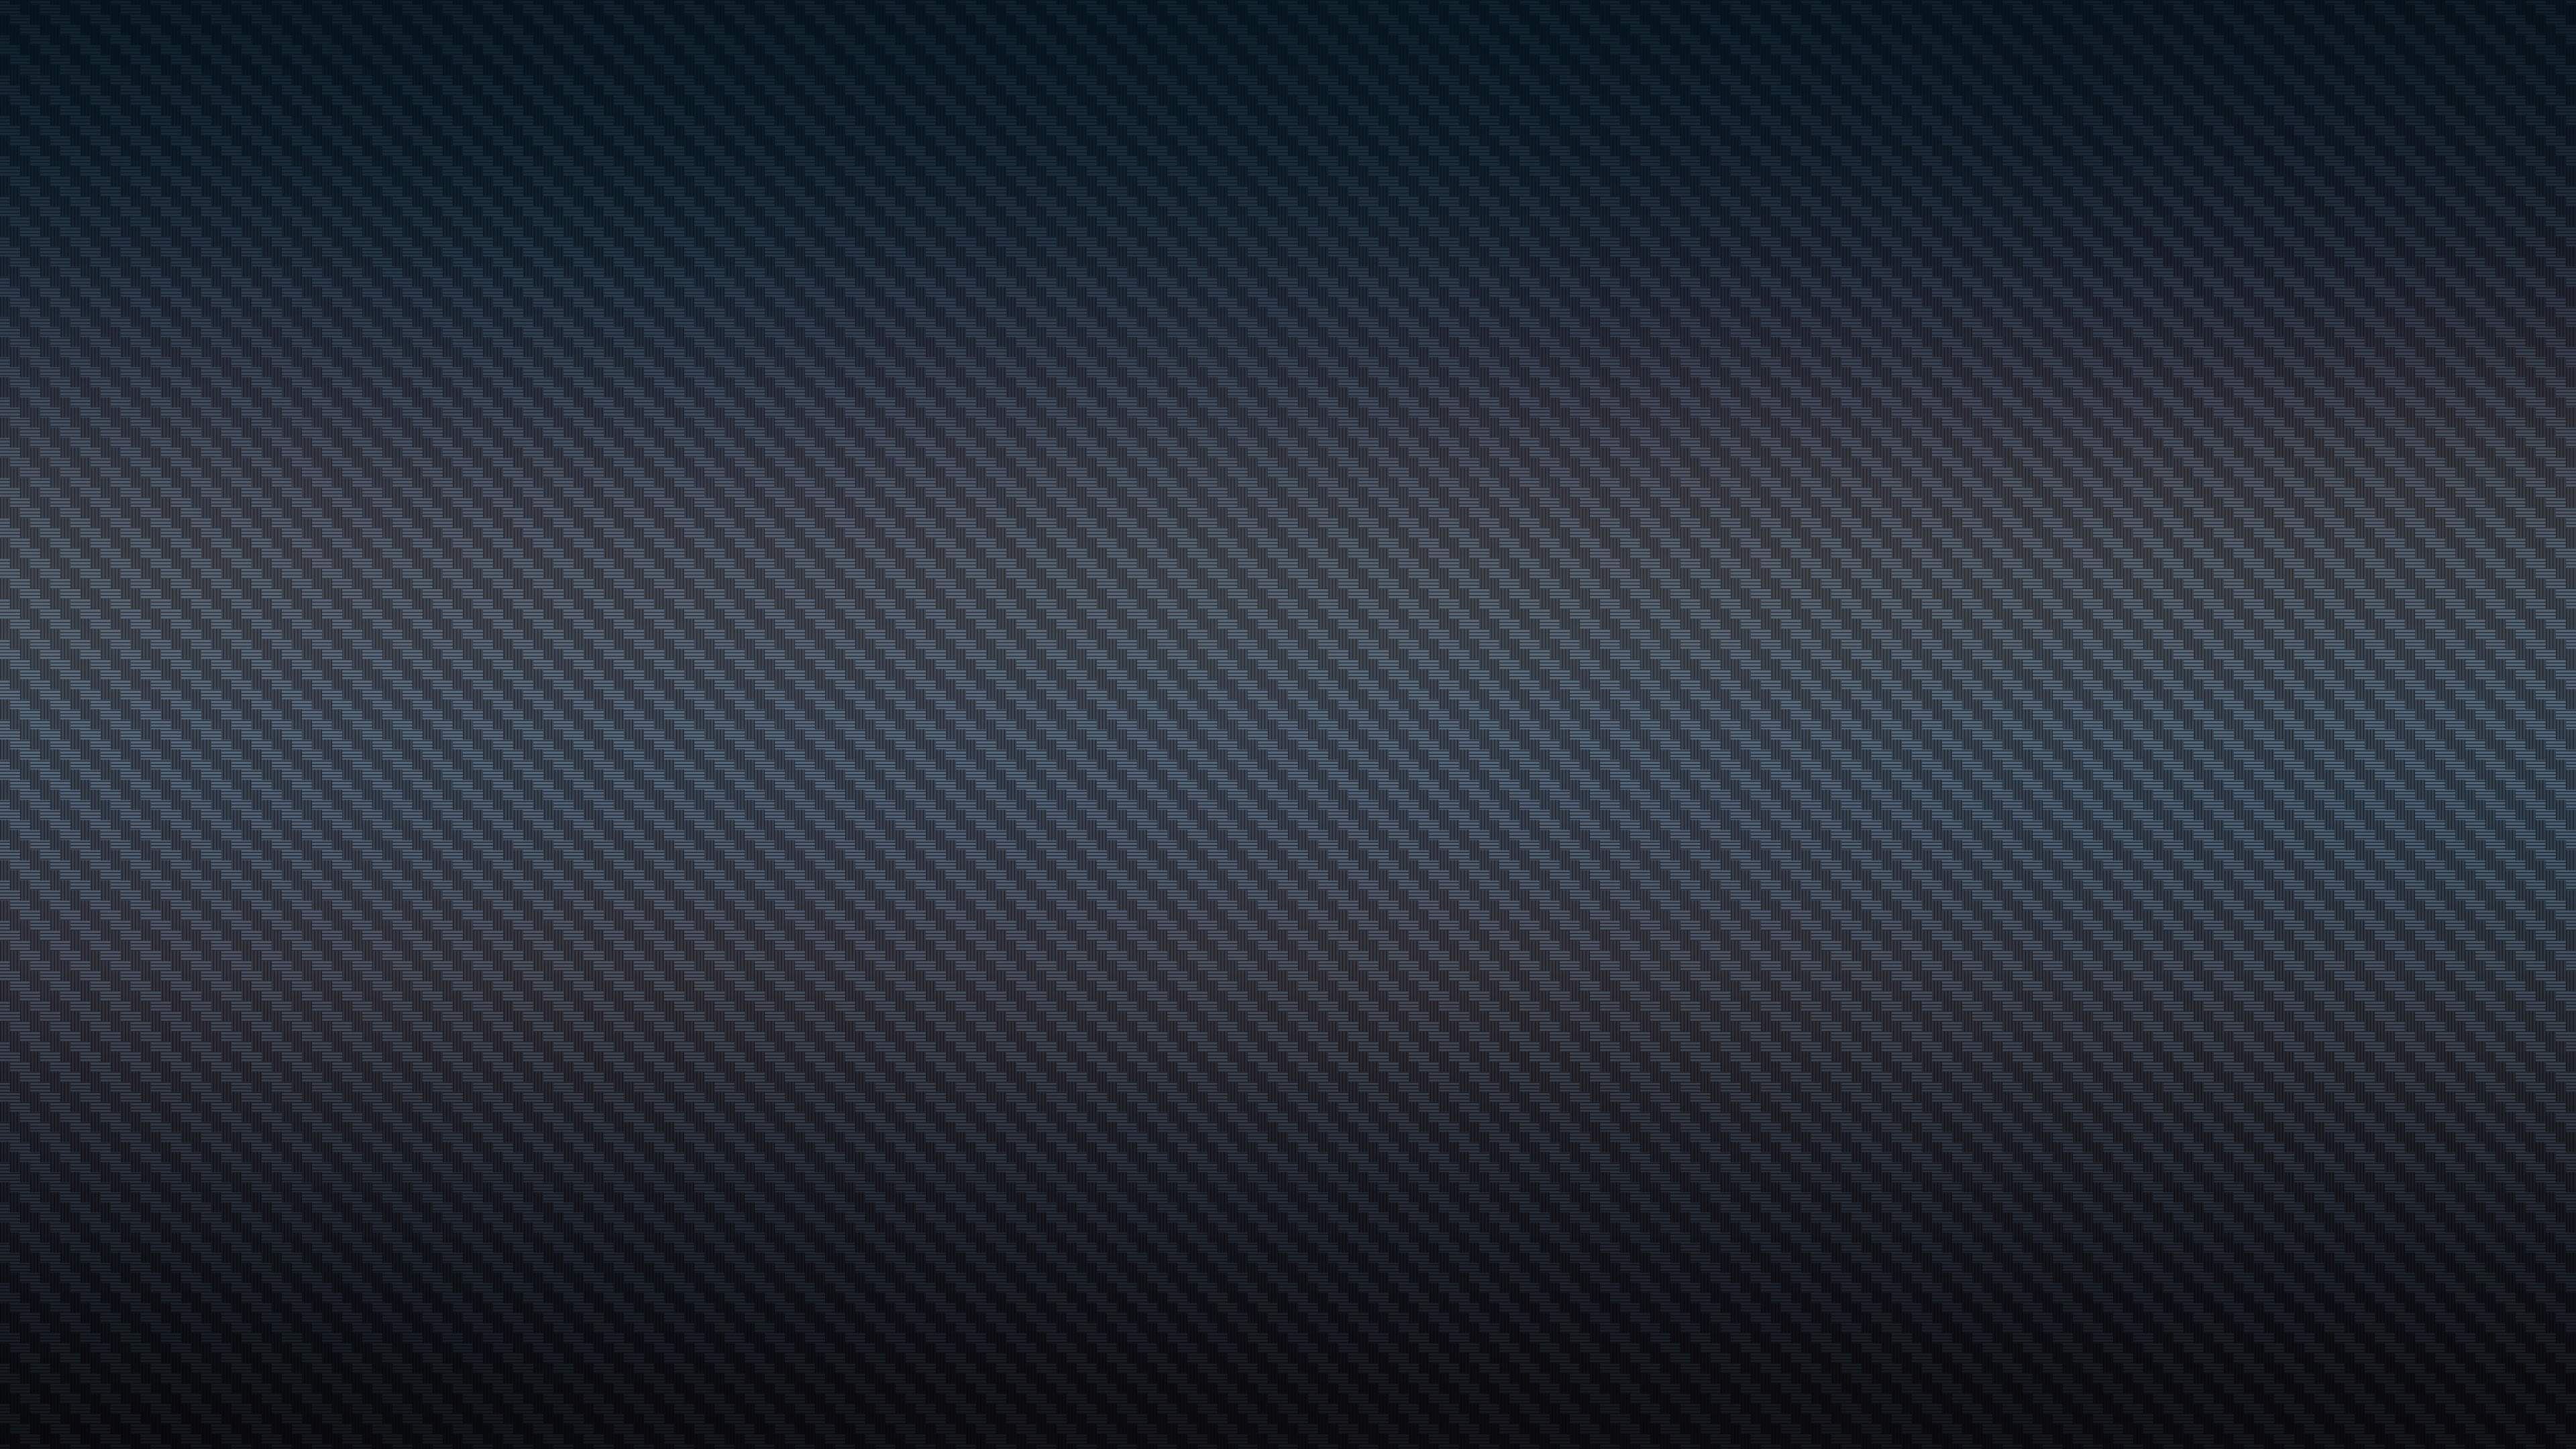 dark abstract pattern 4k 1539371035 - Dark Abstract Pattern 4k - texture wallpapers, pattern wallpapers, hd-wallpapers, dark wallpapers, abstract wallpapers, 4k-wallpapers